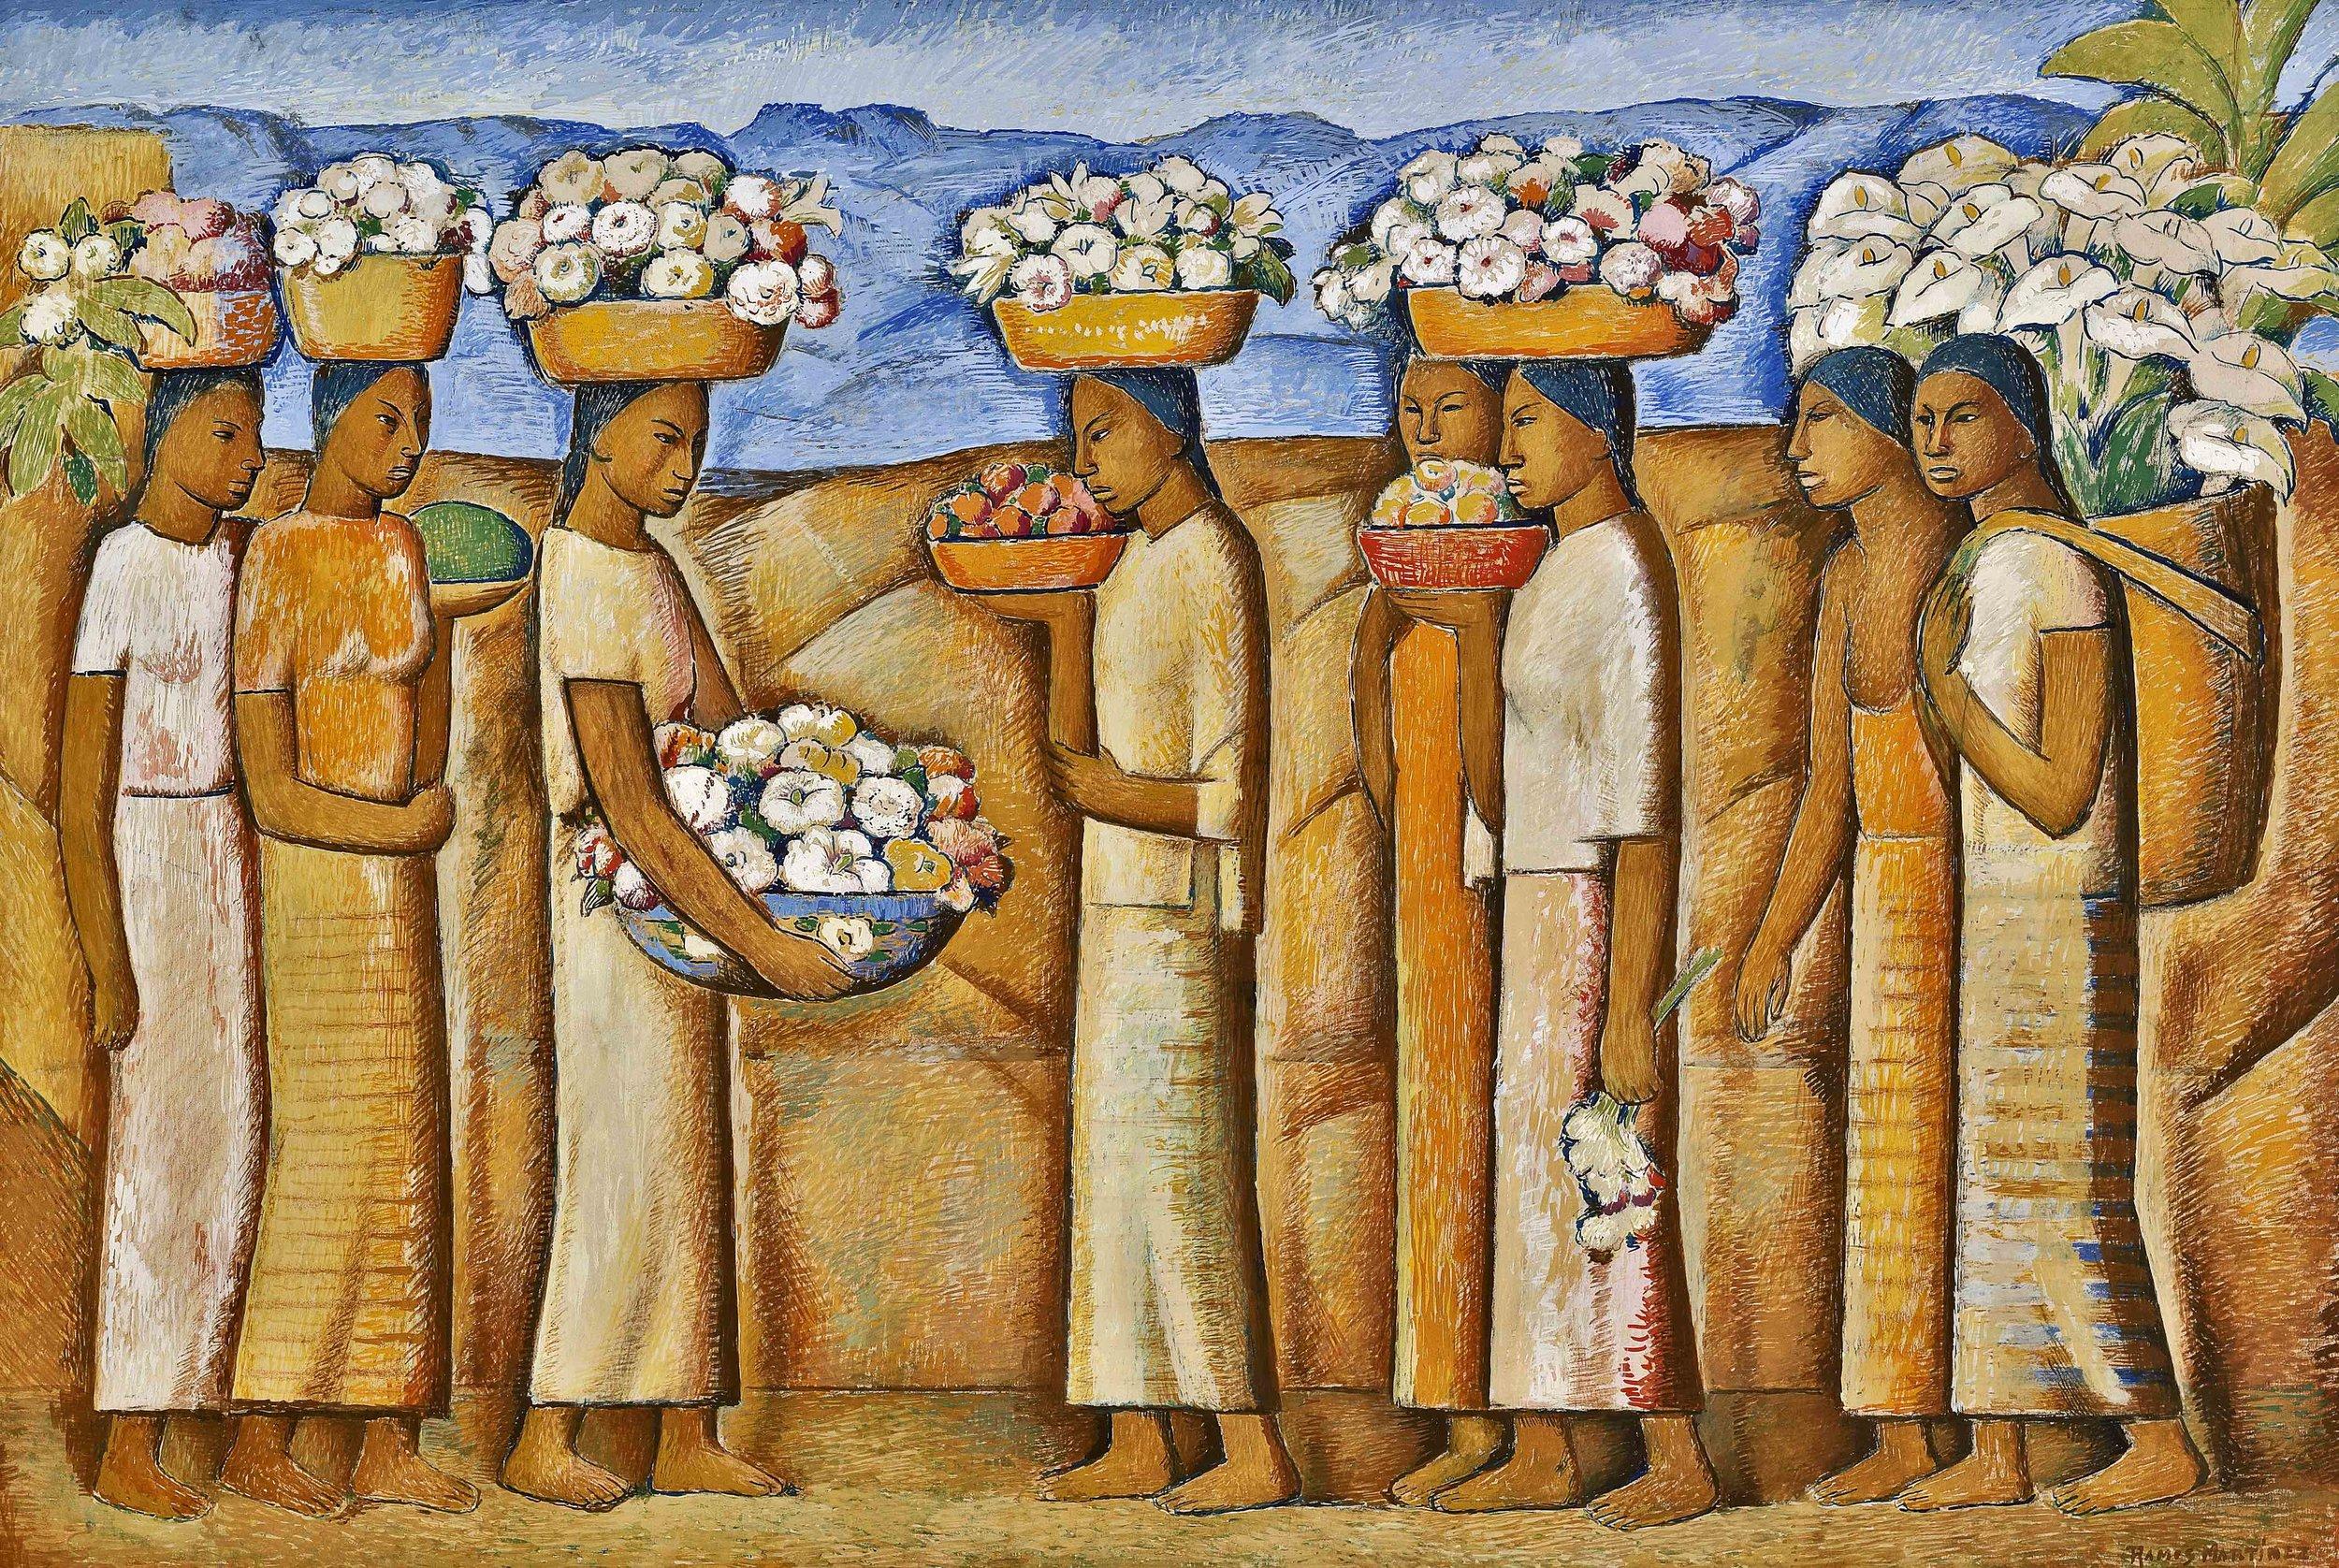 Vendedoras de Flores / Flower Vendors  ca. 1946  tempera on board / temple sobre tabla 20 x 29.8 inches; 50.8 x 75.6 centímetros